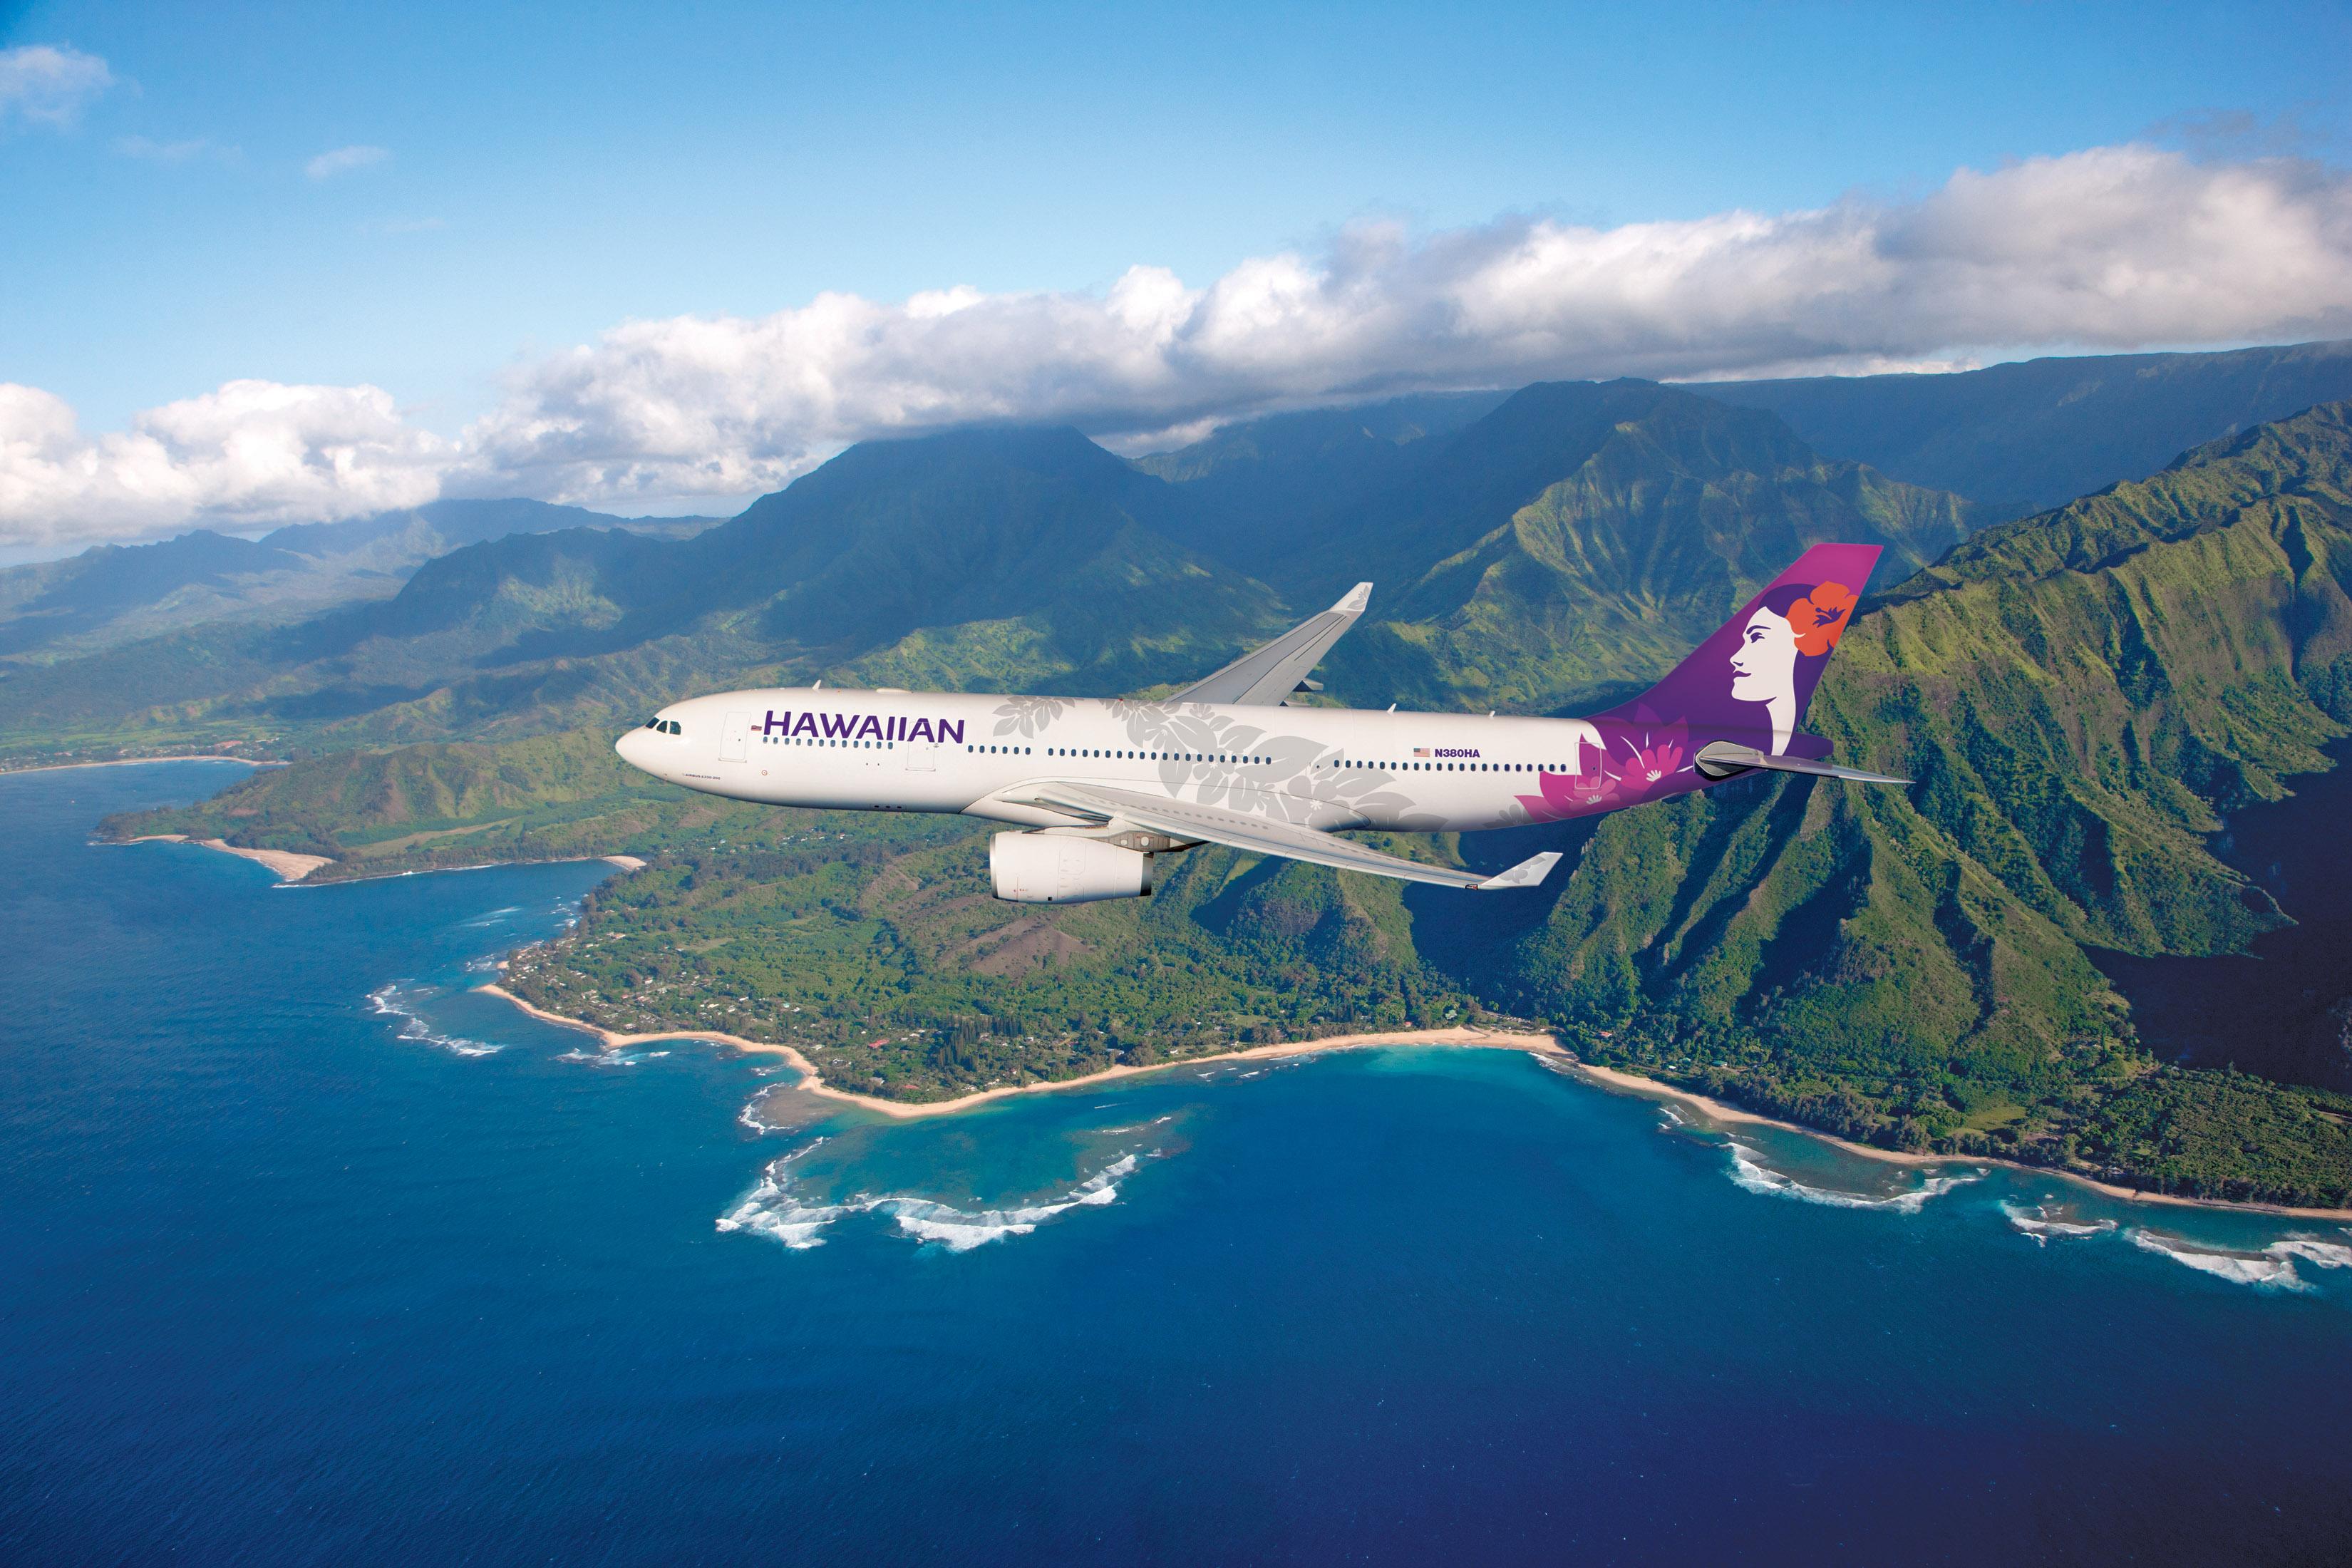 Hawaiian Awarded Approval for New Haneda Route